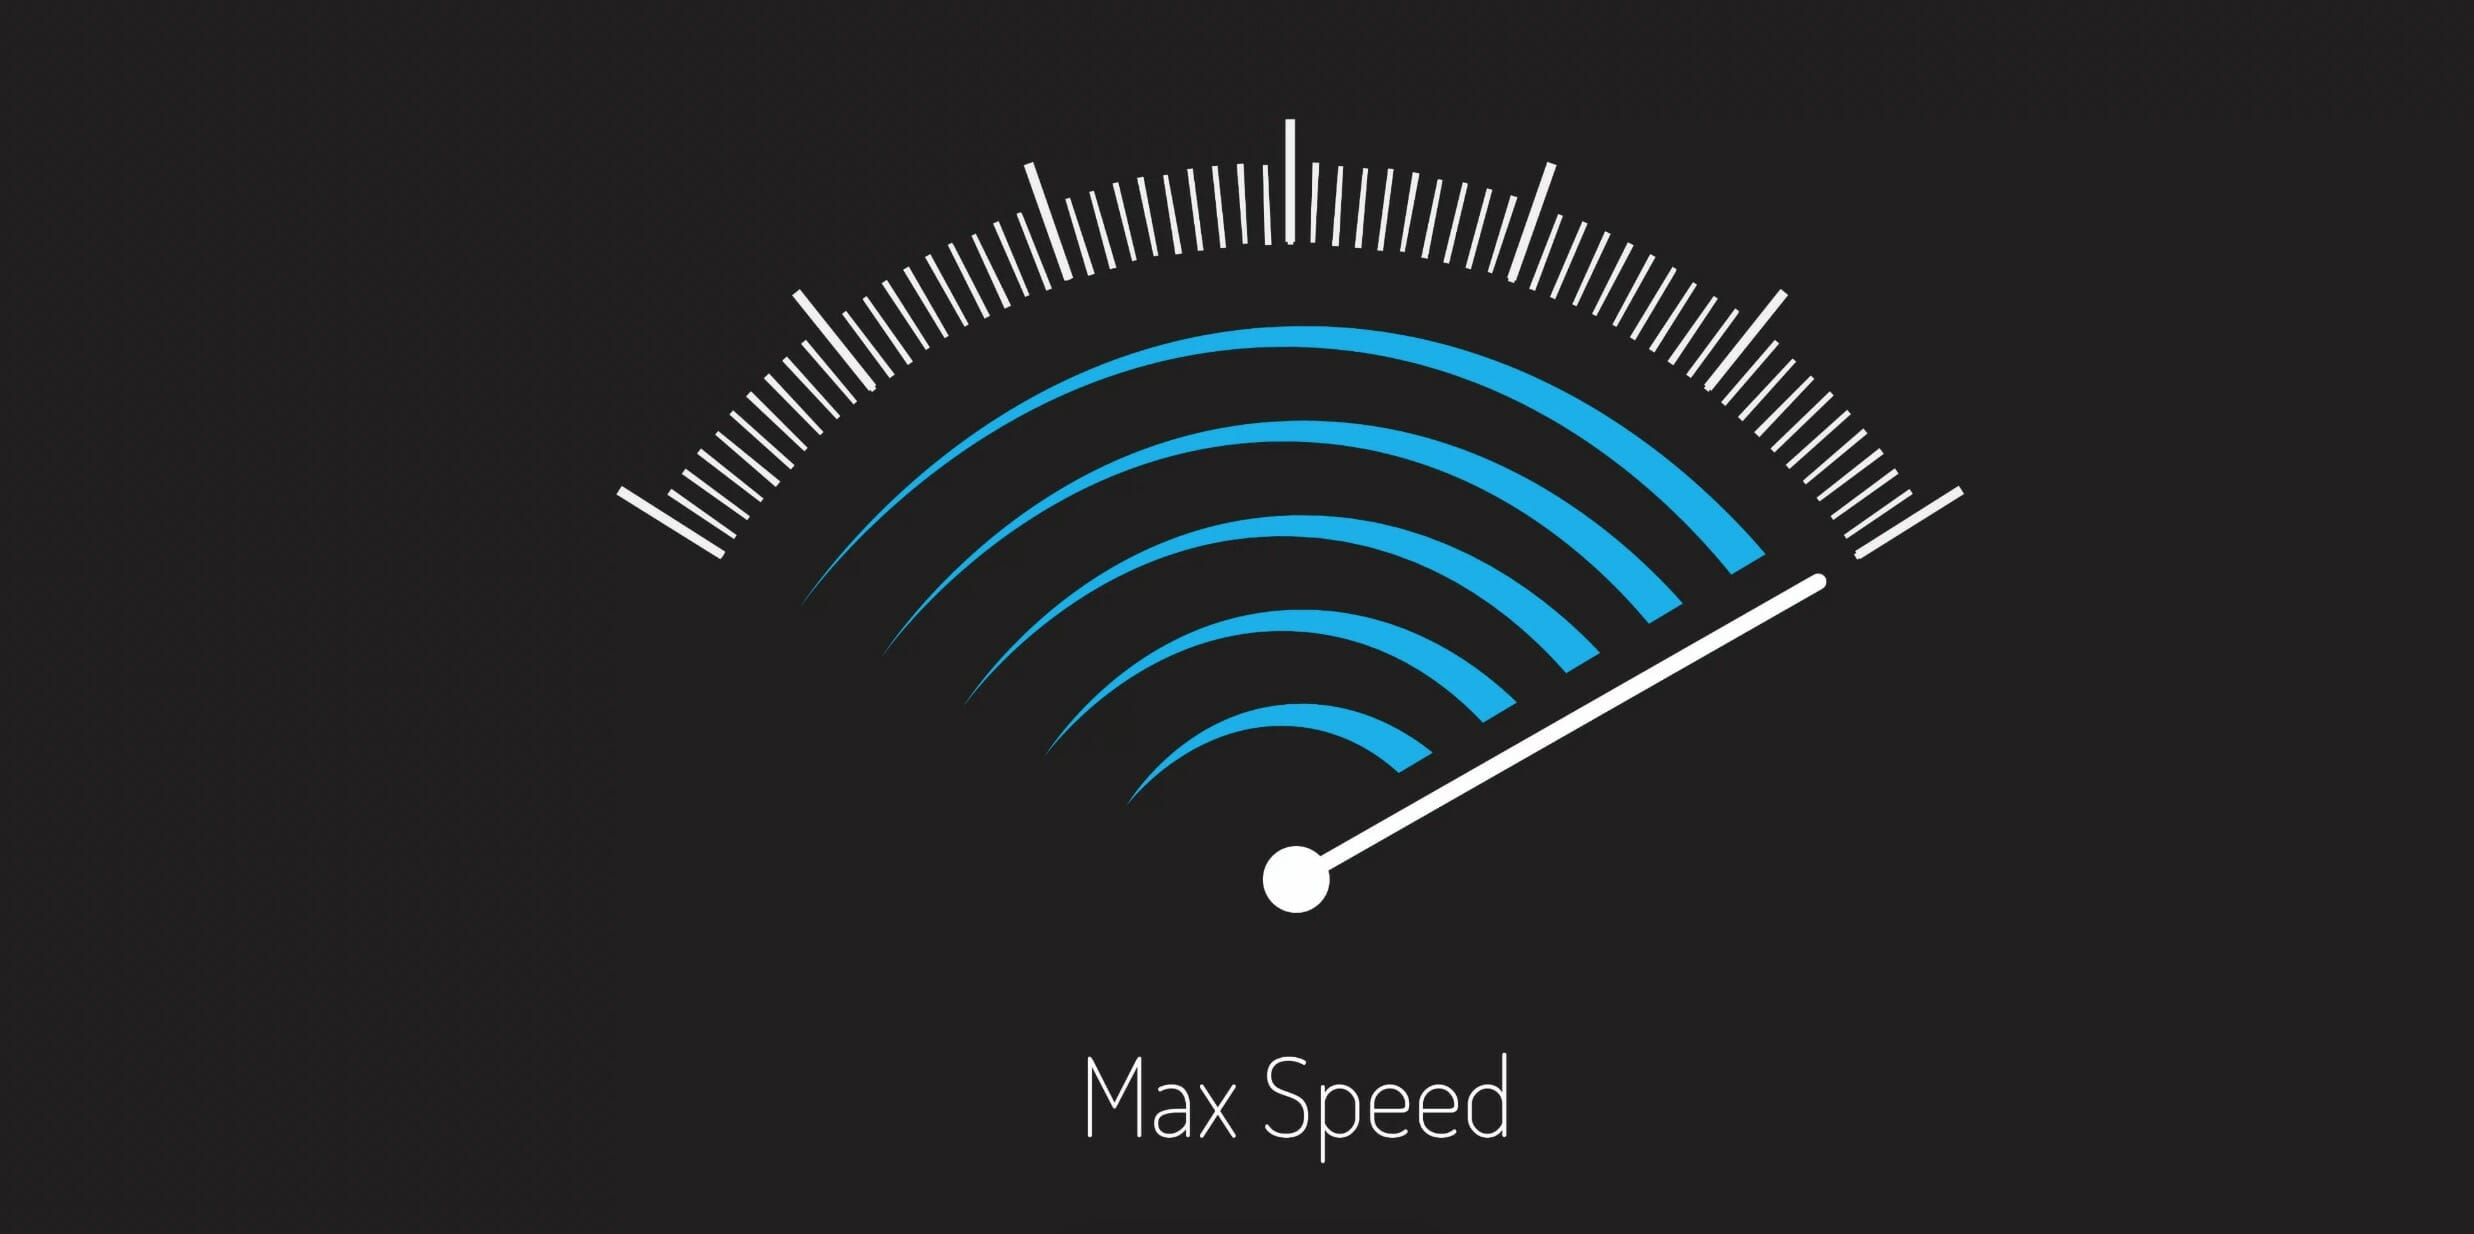 Global Index Reveals Top 10 Fastest Internet Speeds In The World